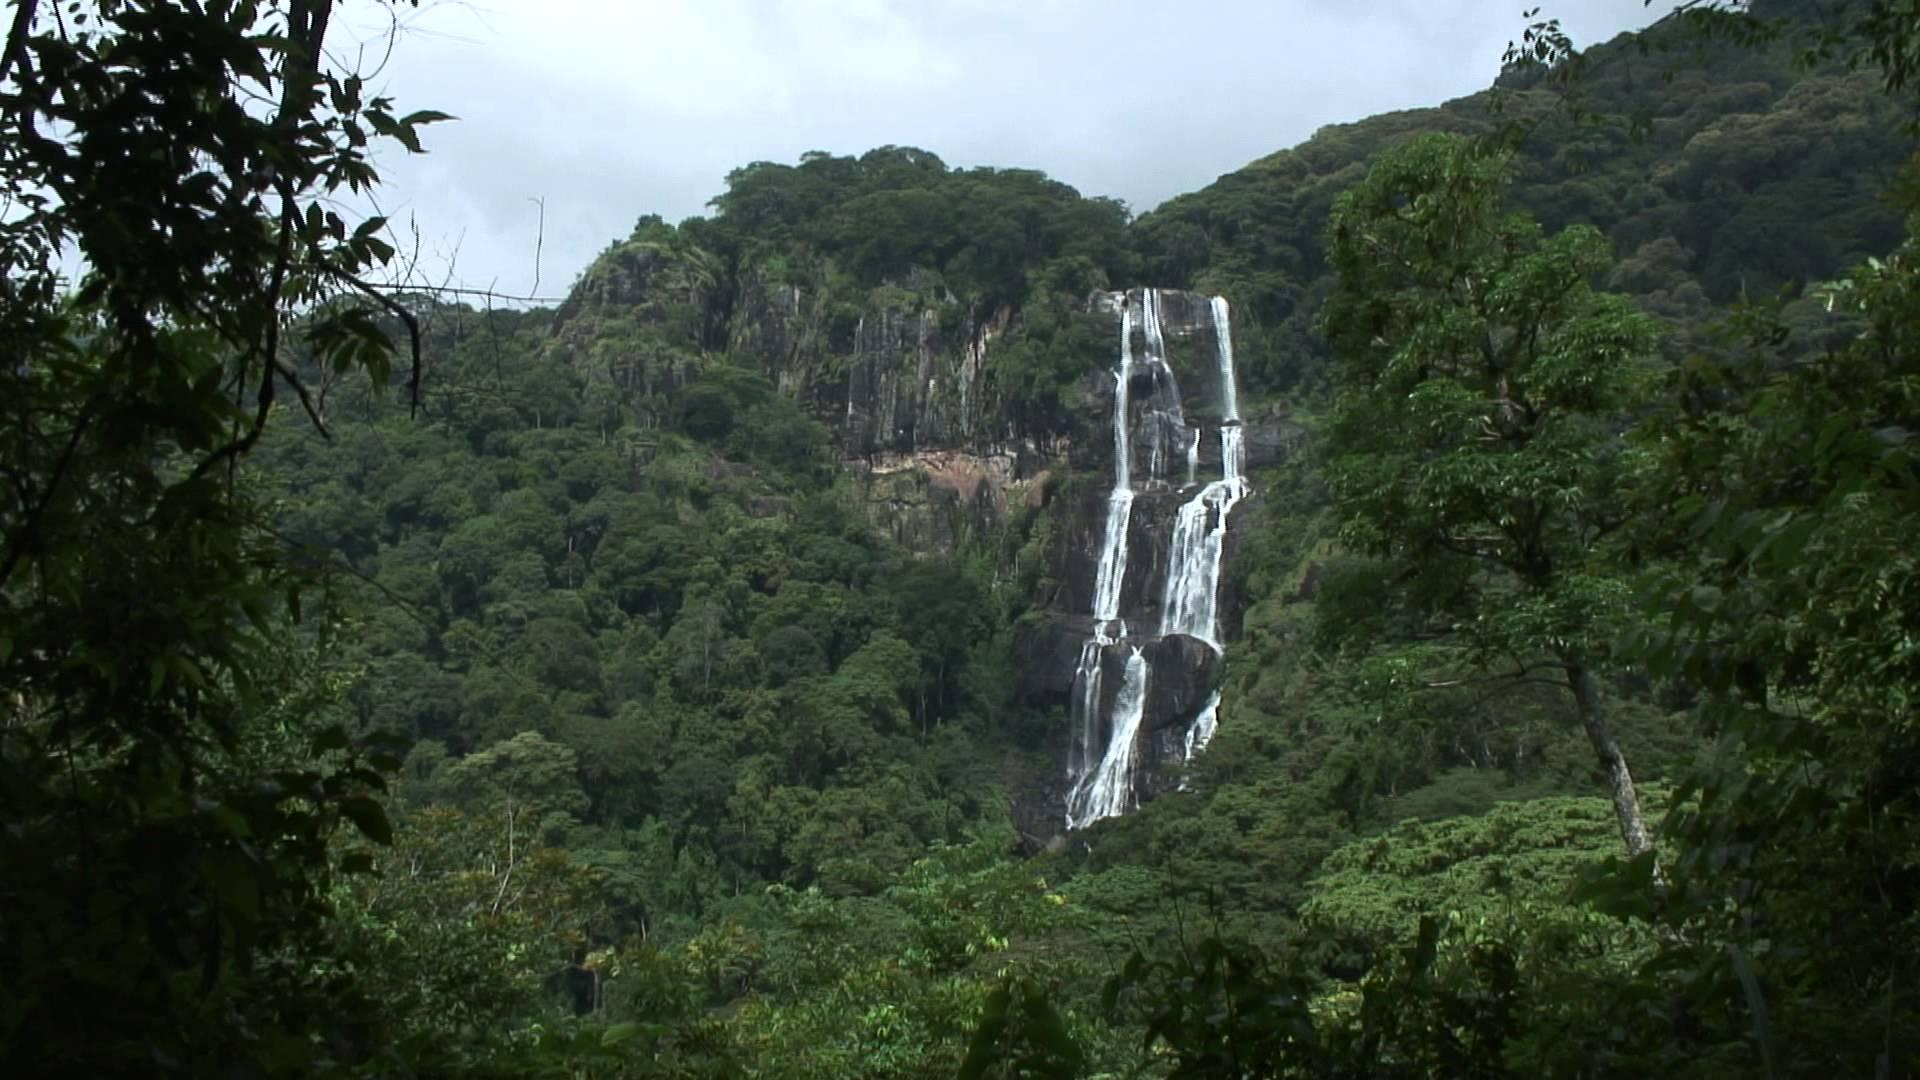 Sanje Waterfalls